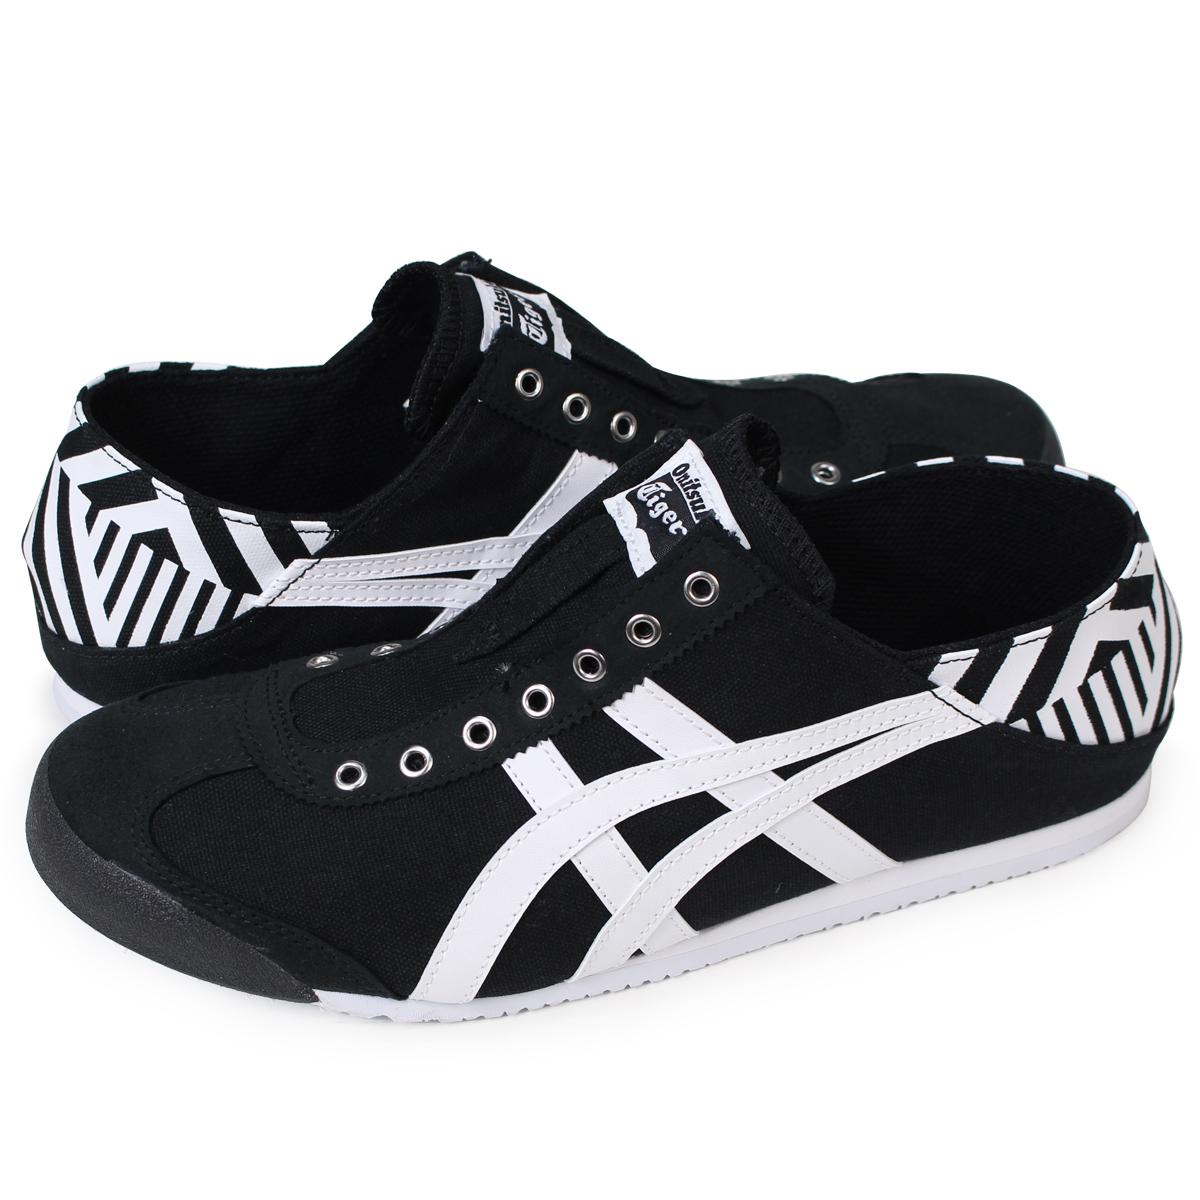 brand new c8e73 9c349 Onitsuka Tiger MEXICO 66 PARATY Onitsuka tiger Mexico 66 slip-ons men gap  Dis sneakers TH342N-9001 black